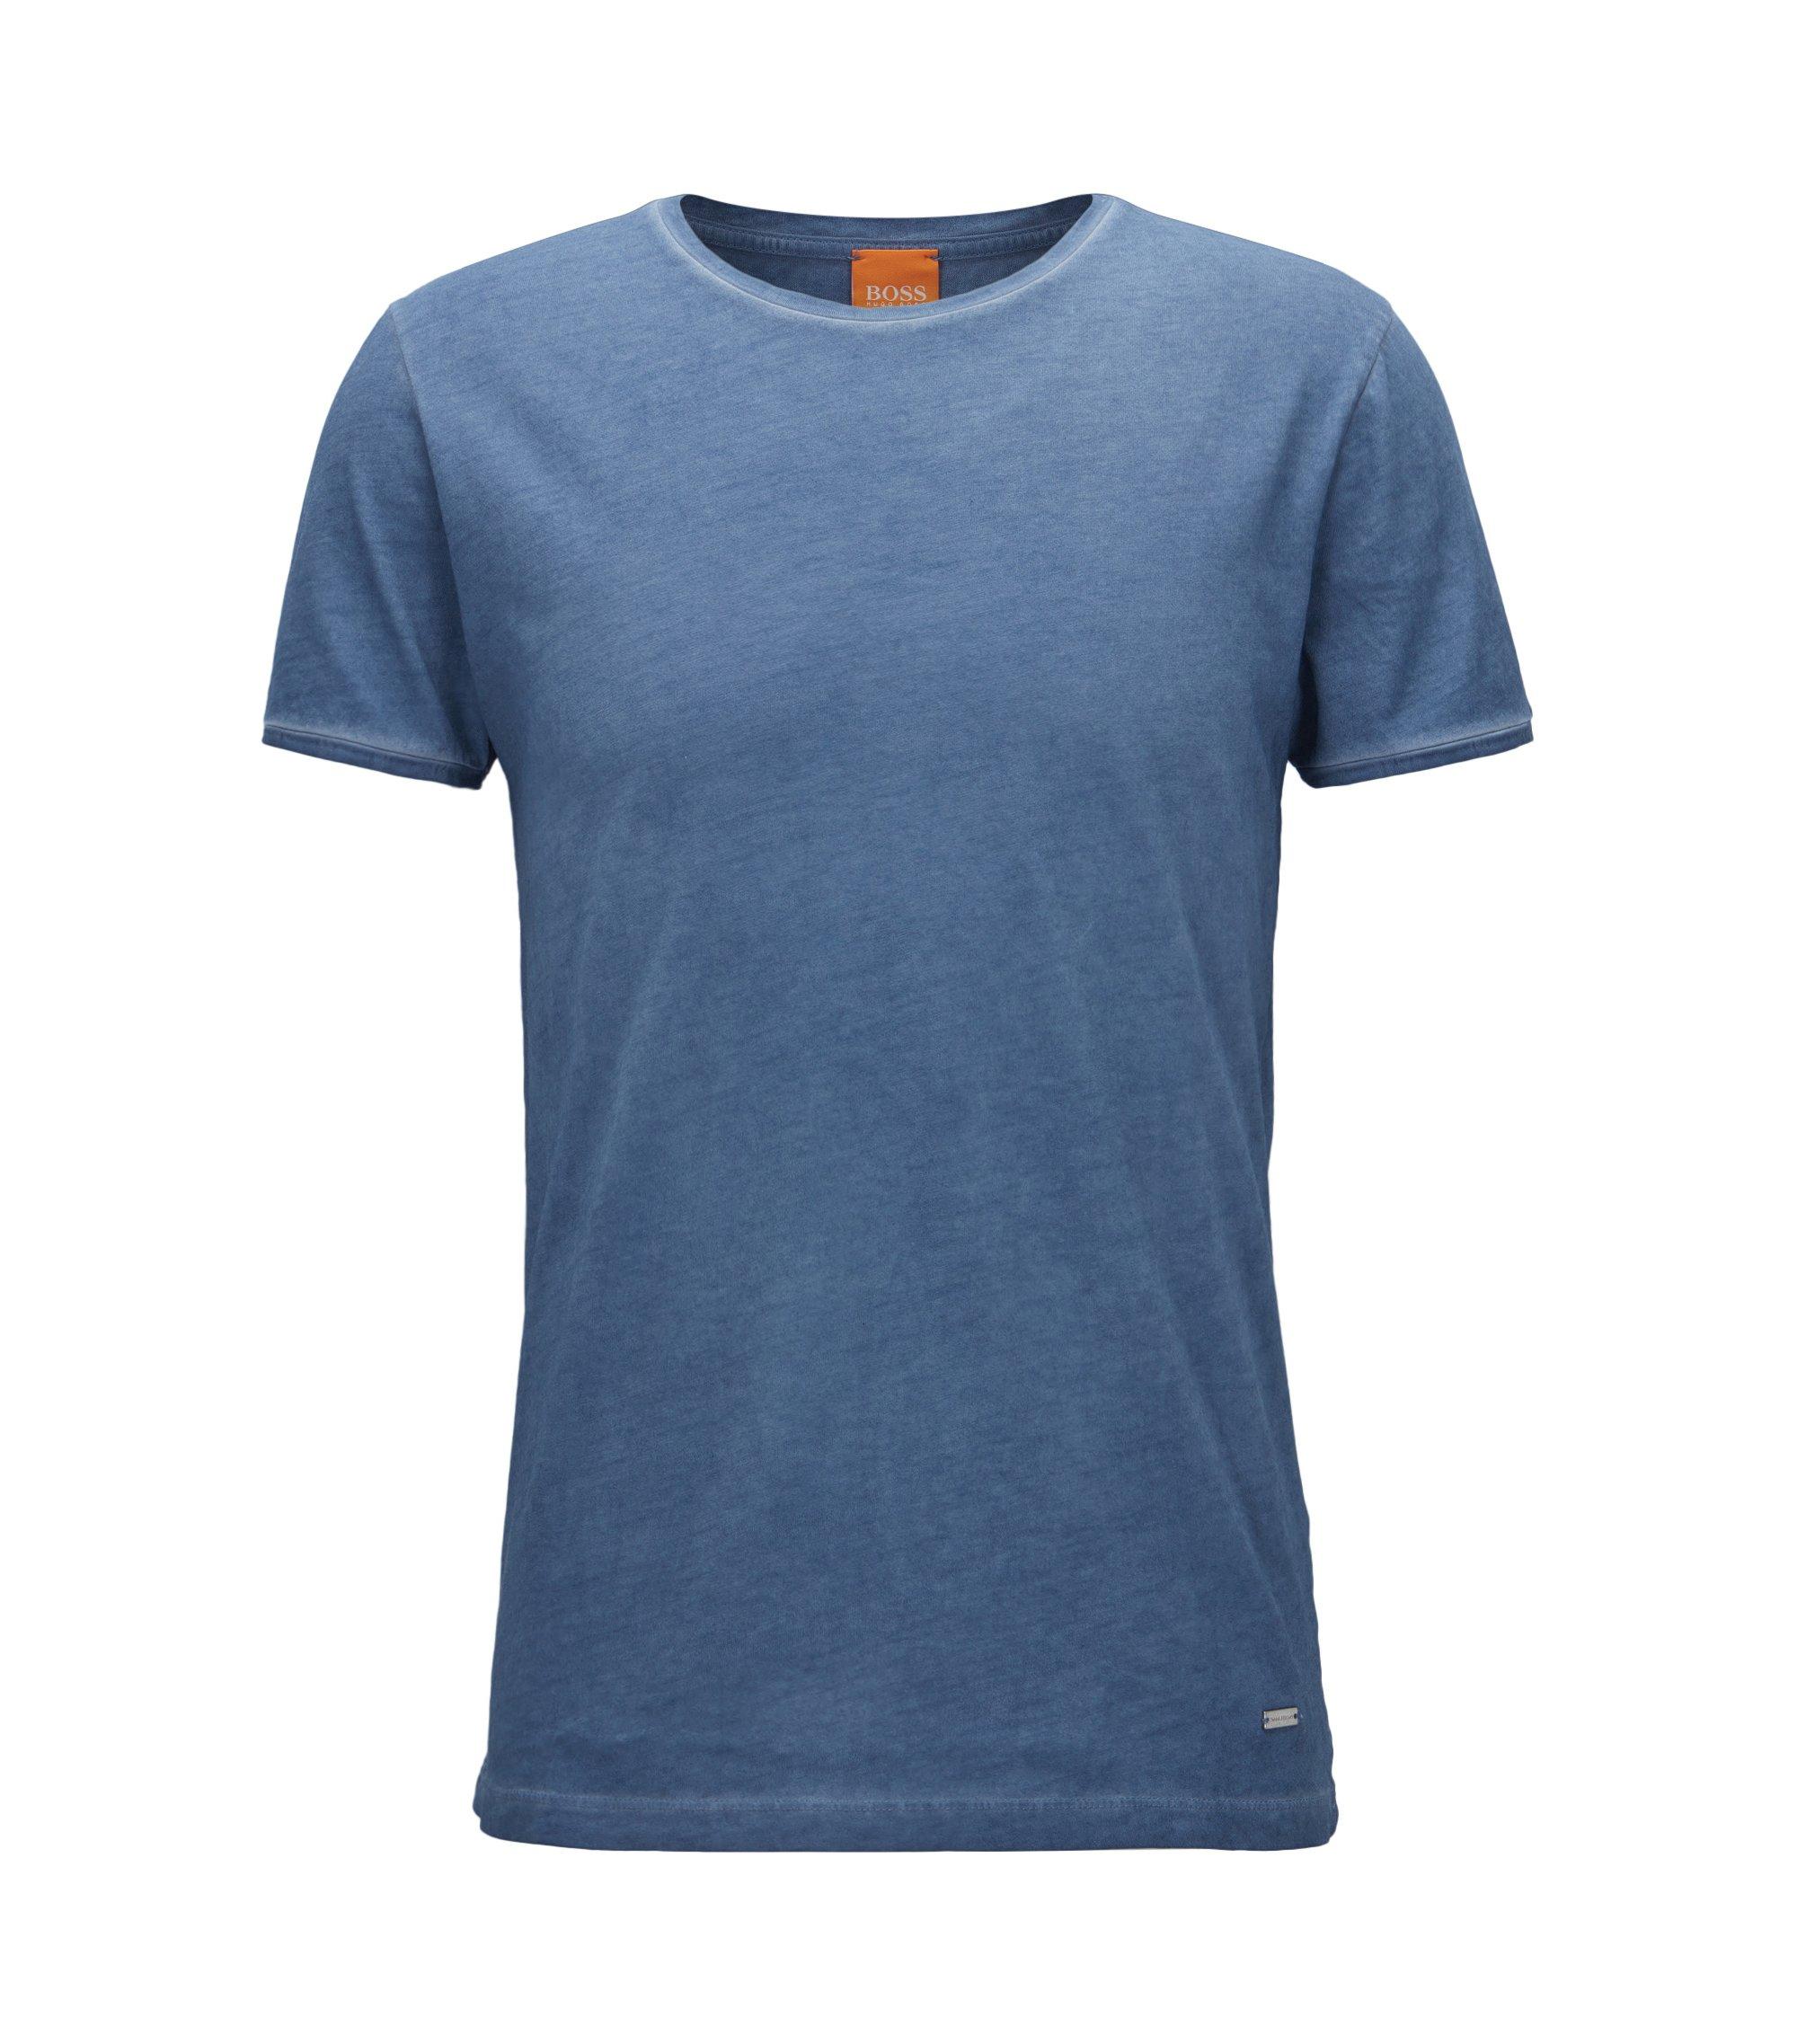 Regular-Fit T-Shirt aus stückgefärbter Baumwolle, Dunkelblau